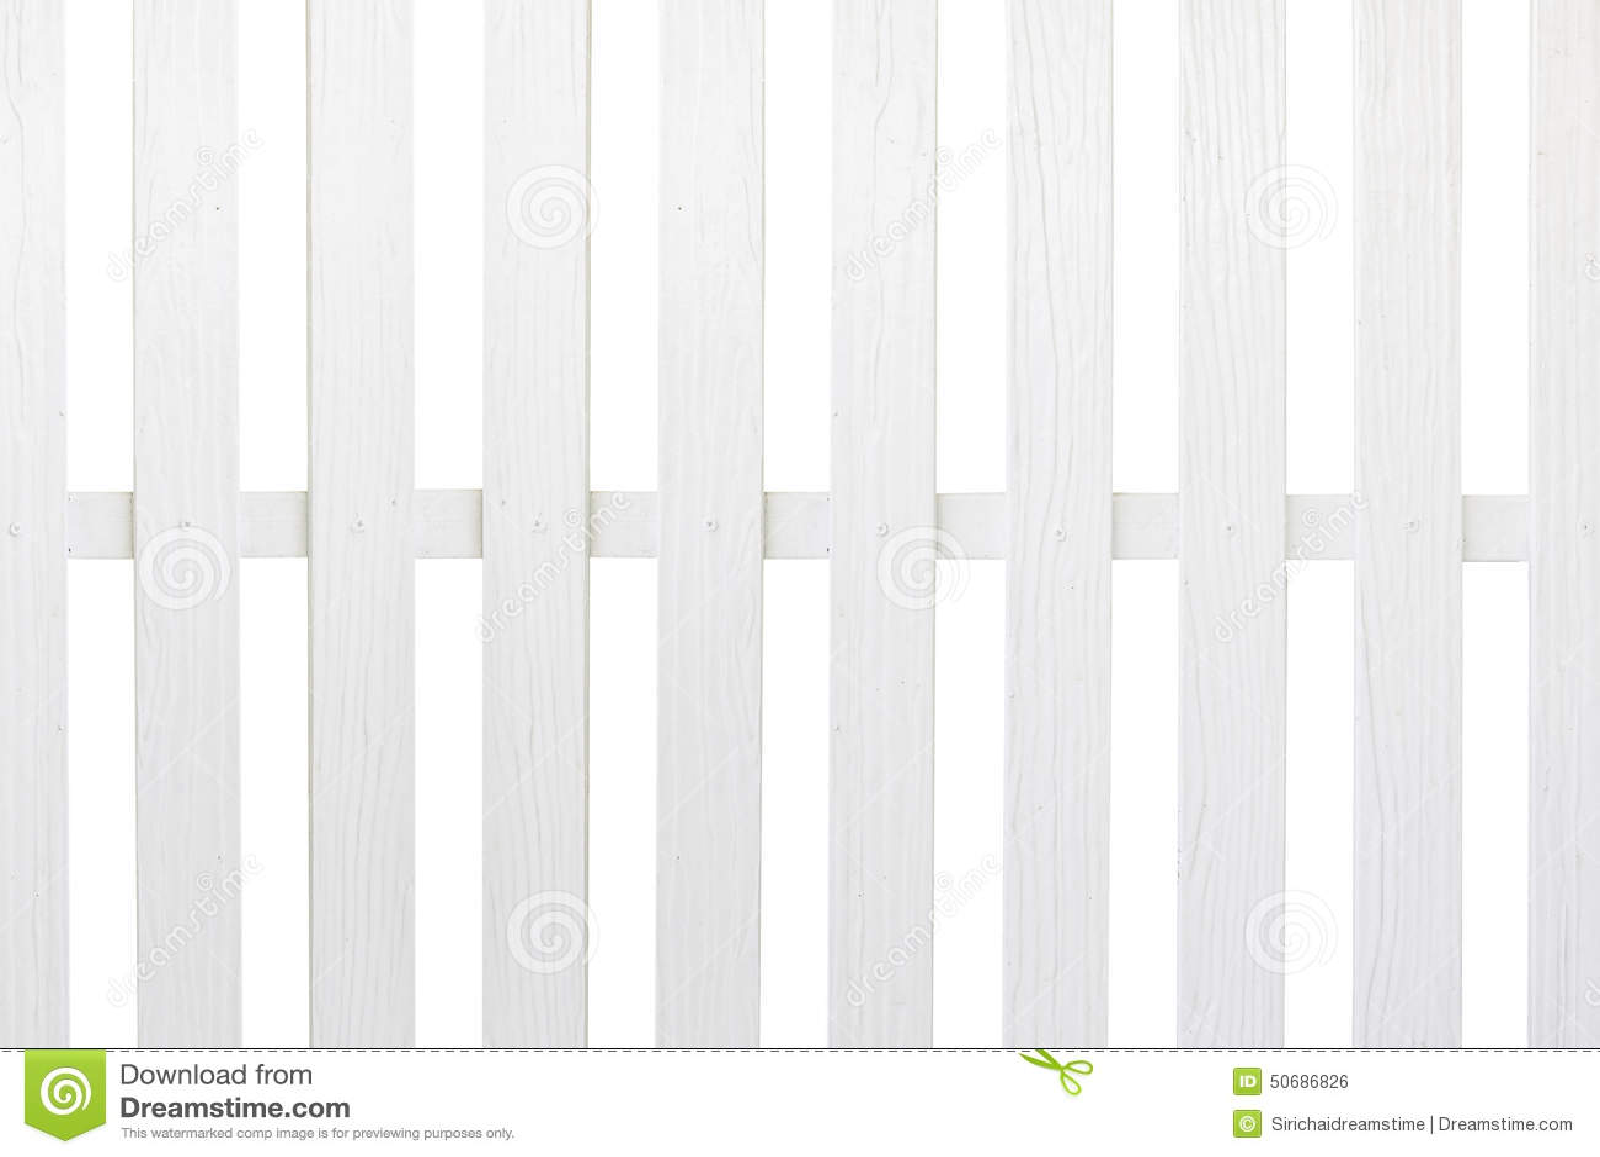 Download 操刀草甸木夏天的向日葵 库存例证. 插画 包括有 板条, 数字式, 前面, 灰色, 纠察队员, 背包徒步旅行者 - 50686826